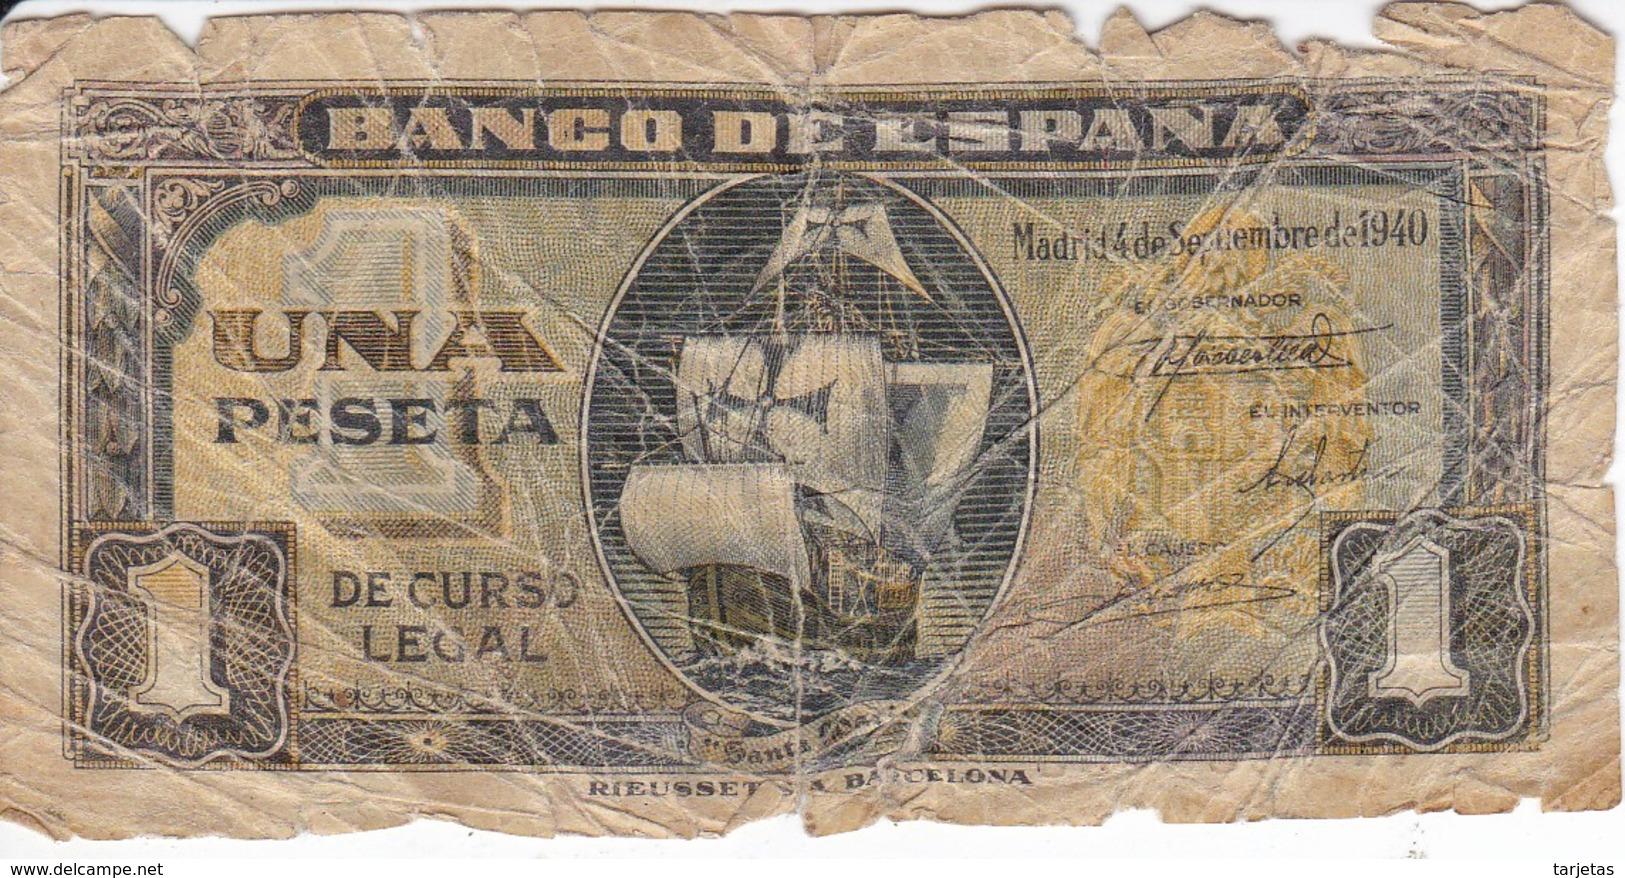 BILLETE DE ESPAÑA DE 1 PTA DEL 4/09/1940 SERIE A CARAVELA  (BANKNOTE) - 1-2 Pesetas